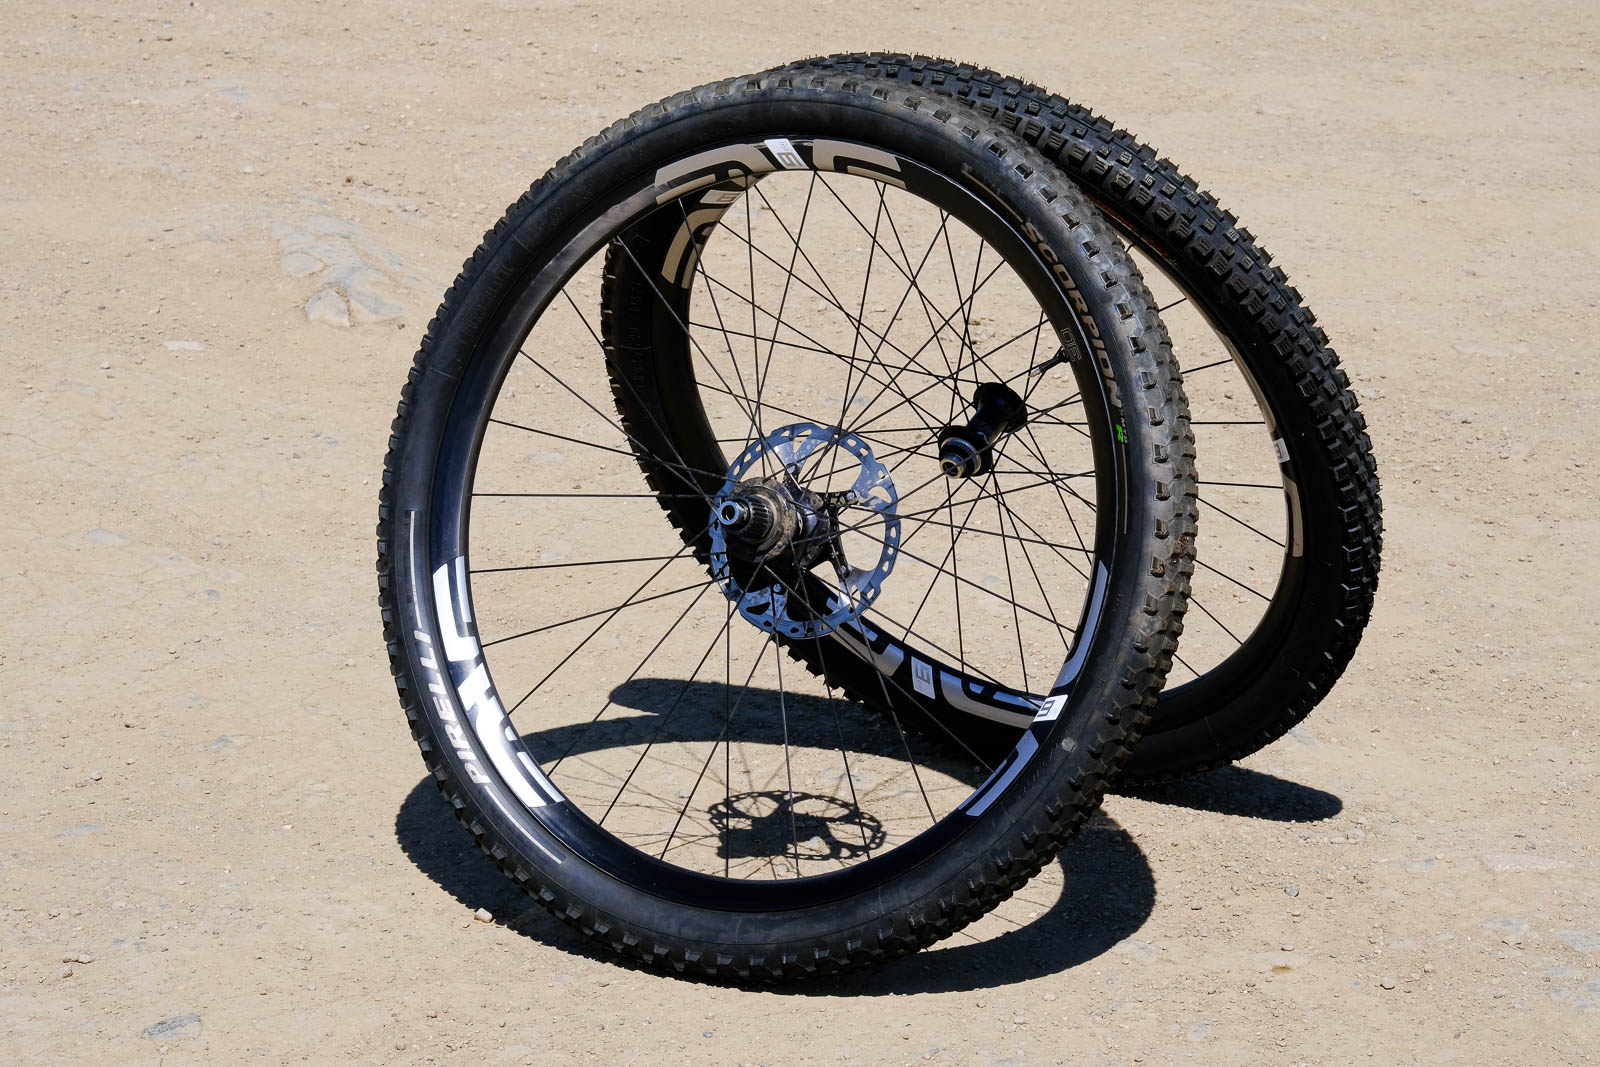 Enve M6 wheels